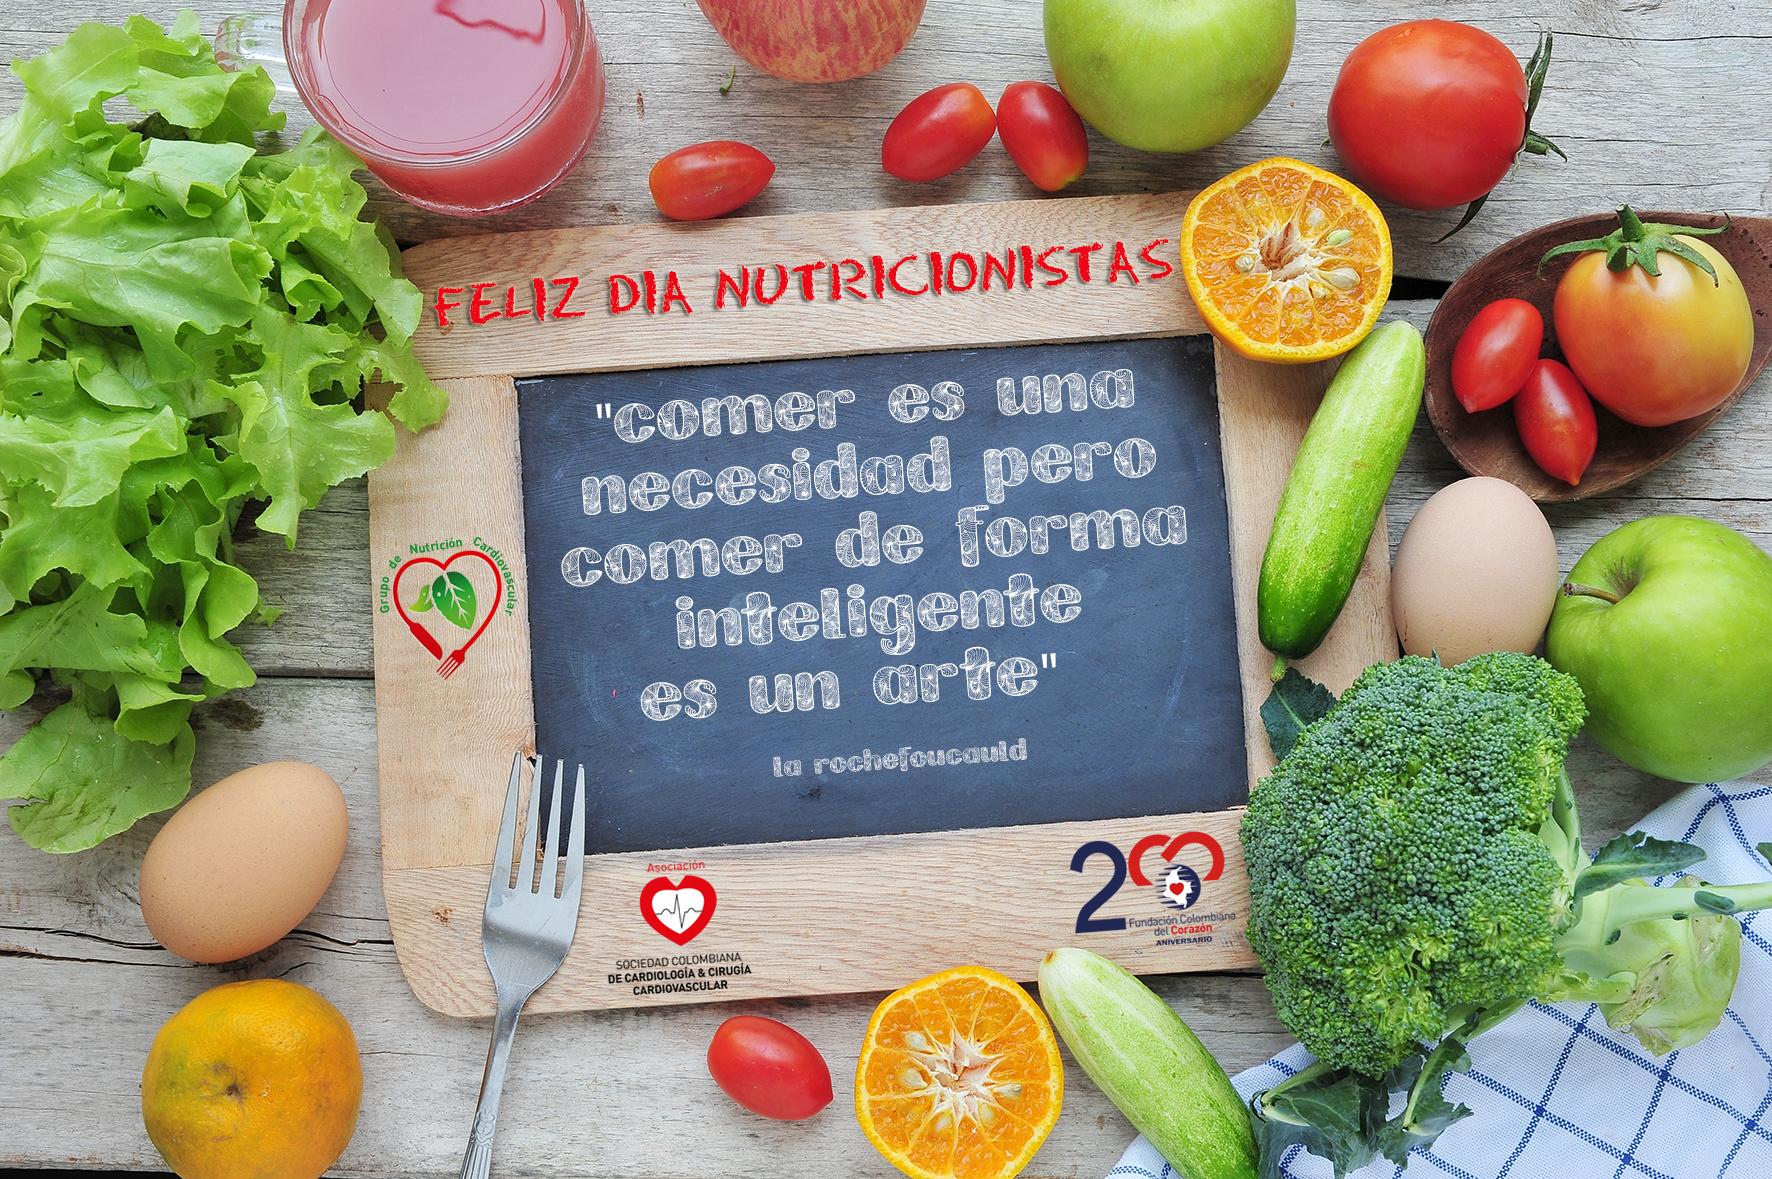 Dia nutricionista 2020